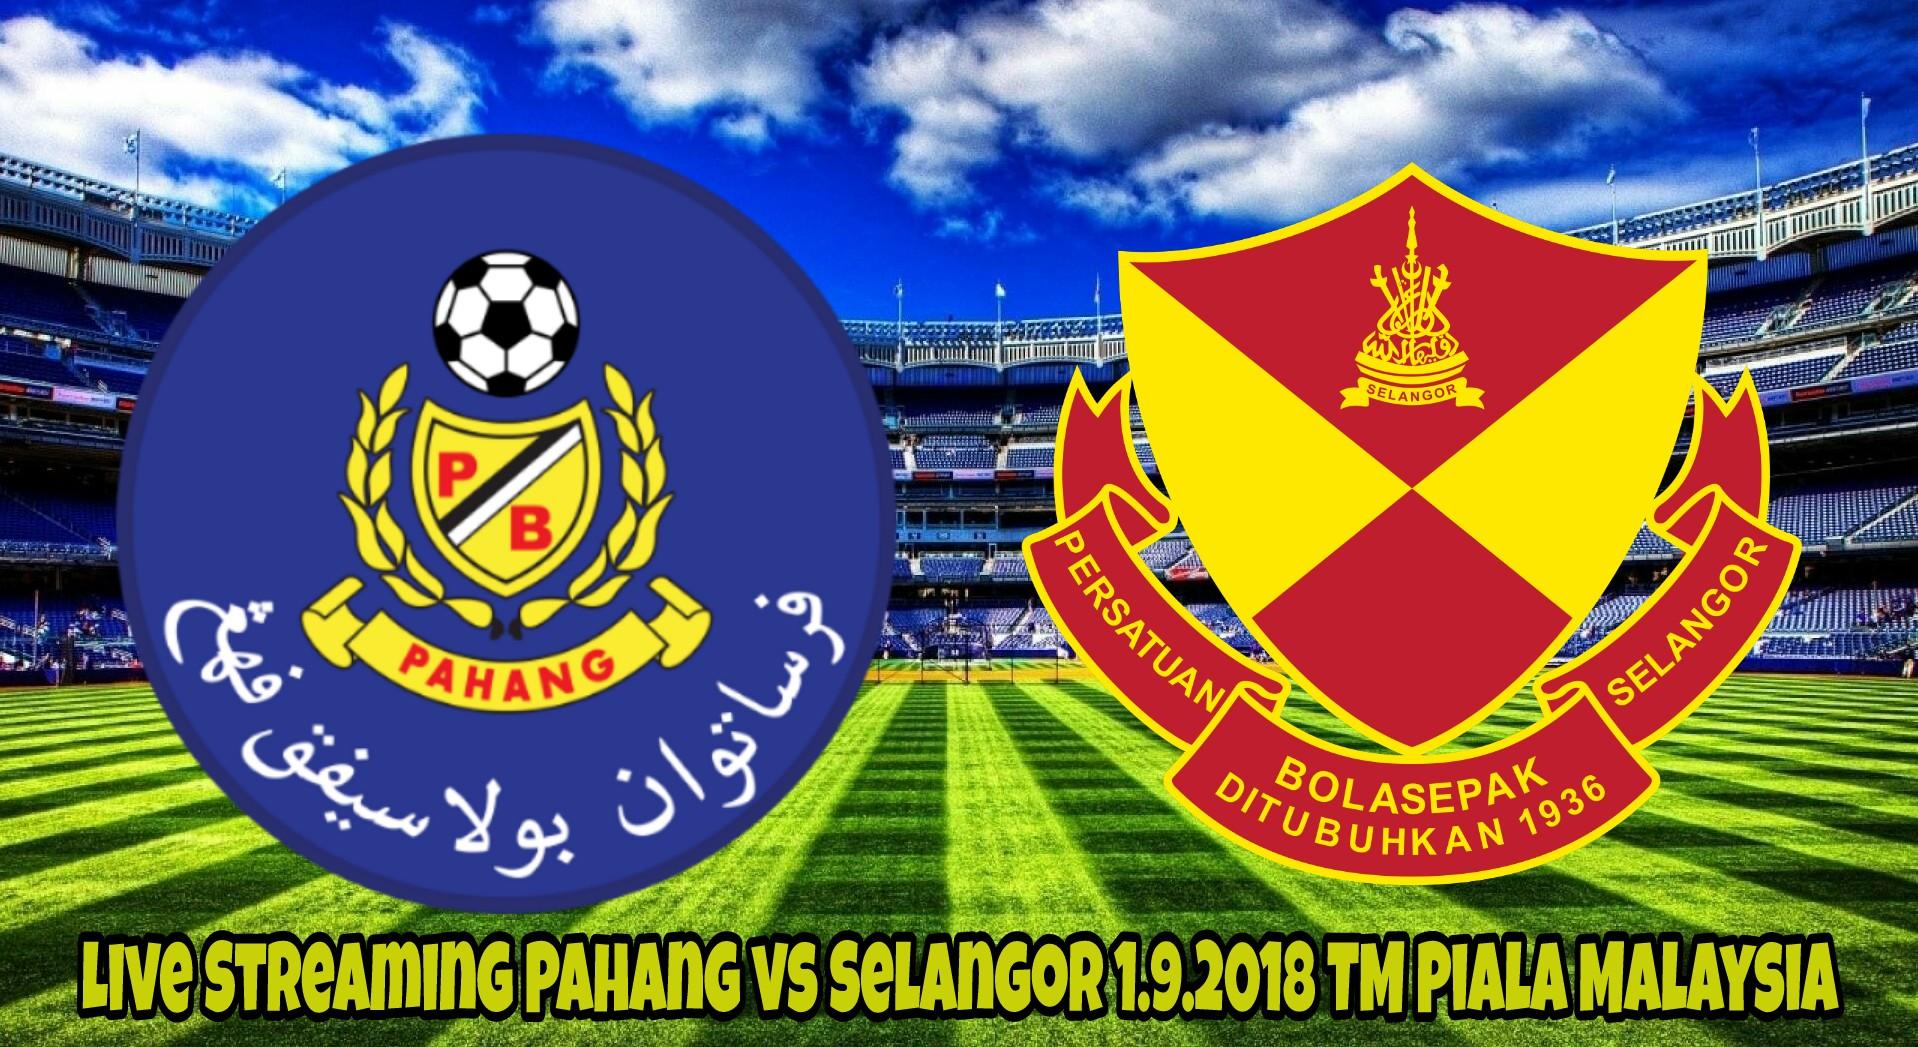 Live Streaming Pahang vs Selangor 1.9.2018 TM Piala Malaysia